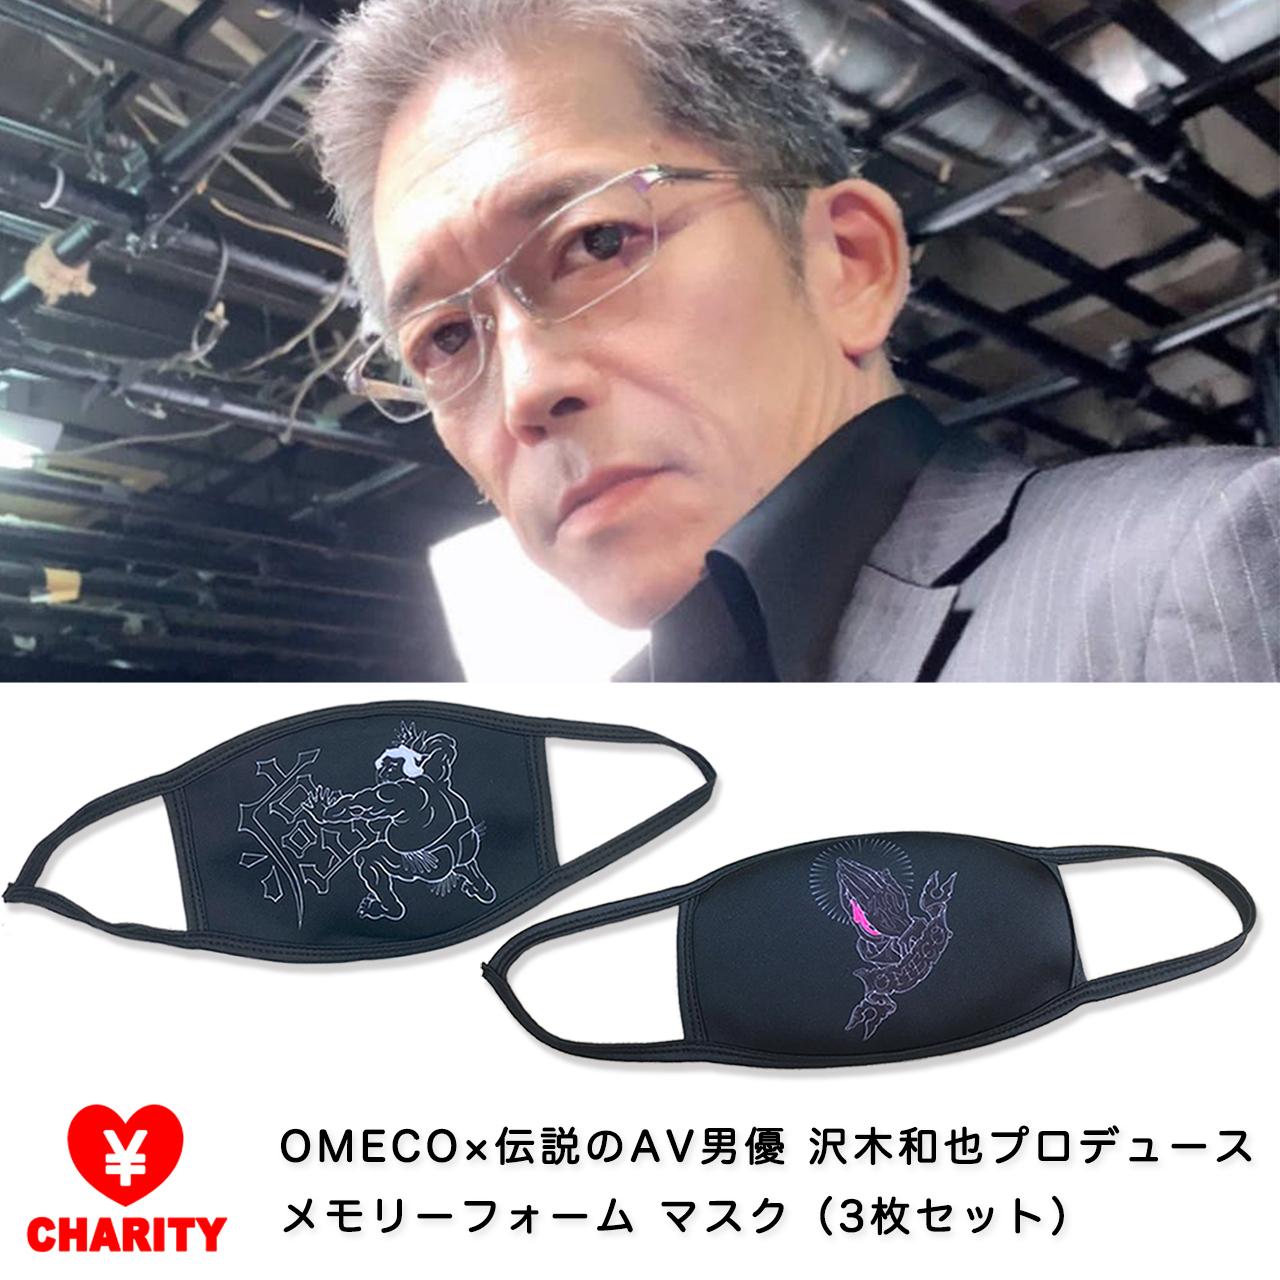 OMECO AV男優 沢木和也プロデュース メモリーフォーム マスク 3枚セット(洗って使えるマスク、繰り返し使用可)[クリックポスト配送]